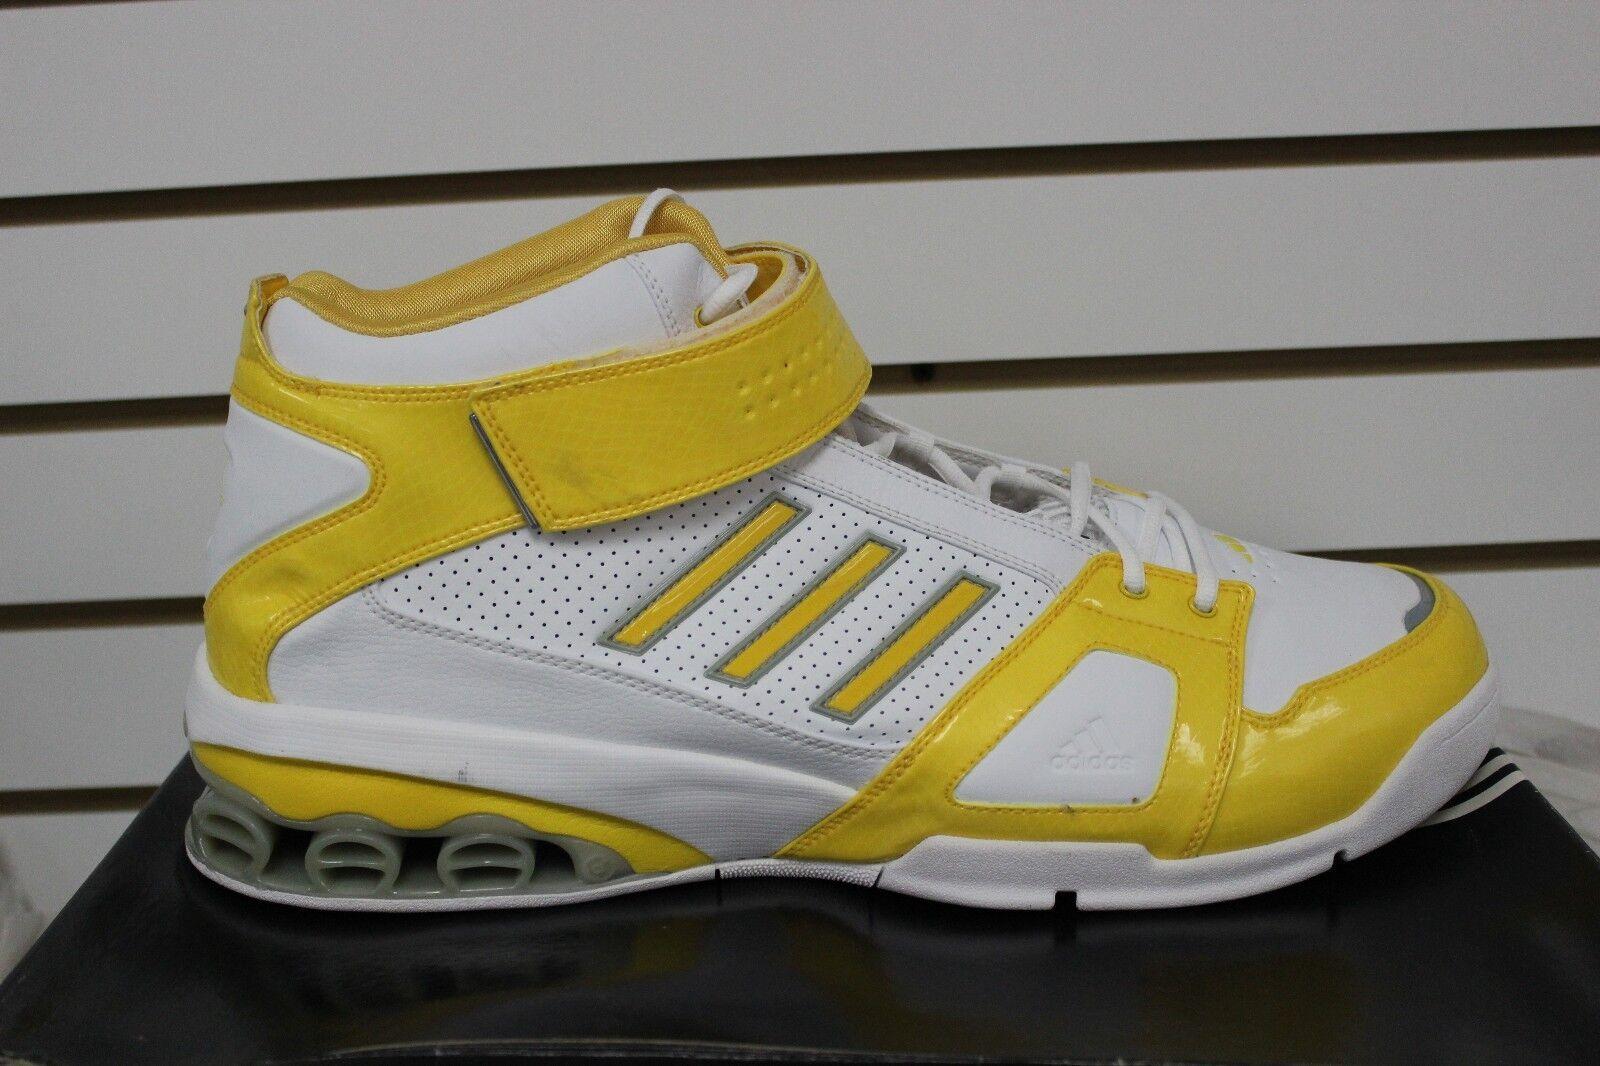 Uomini adidas ast nba j smoov josh smith basket bianco   giallo 667474 | Commercio All'ingrosso  | Uomini/Donne Scarpa